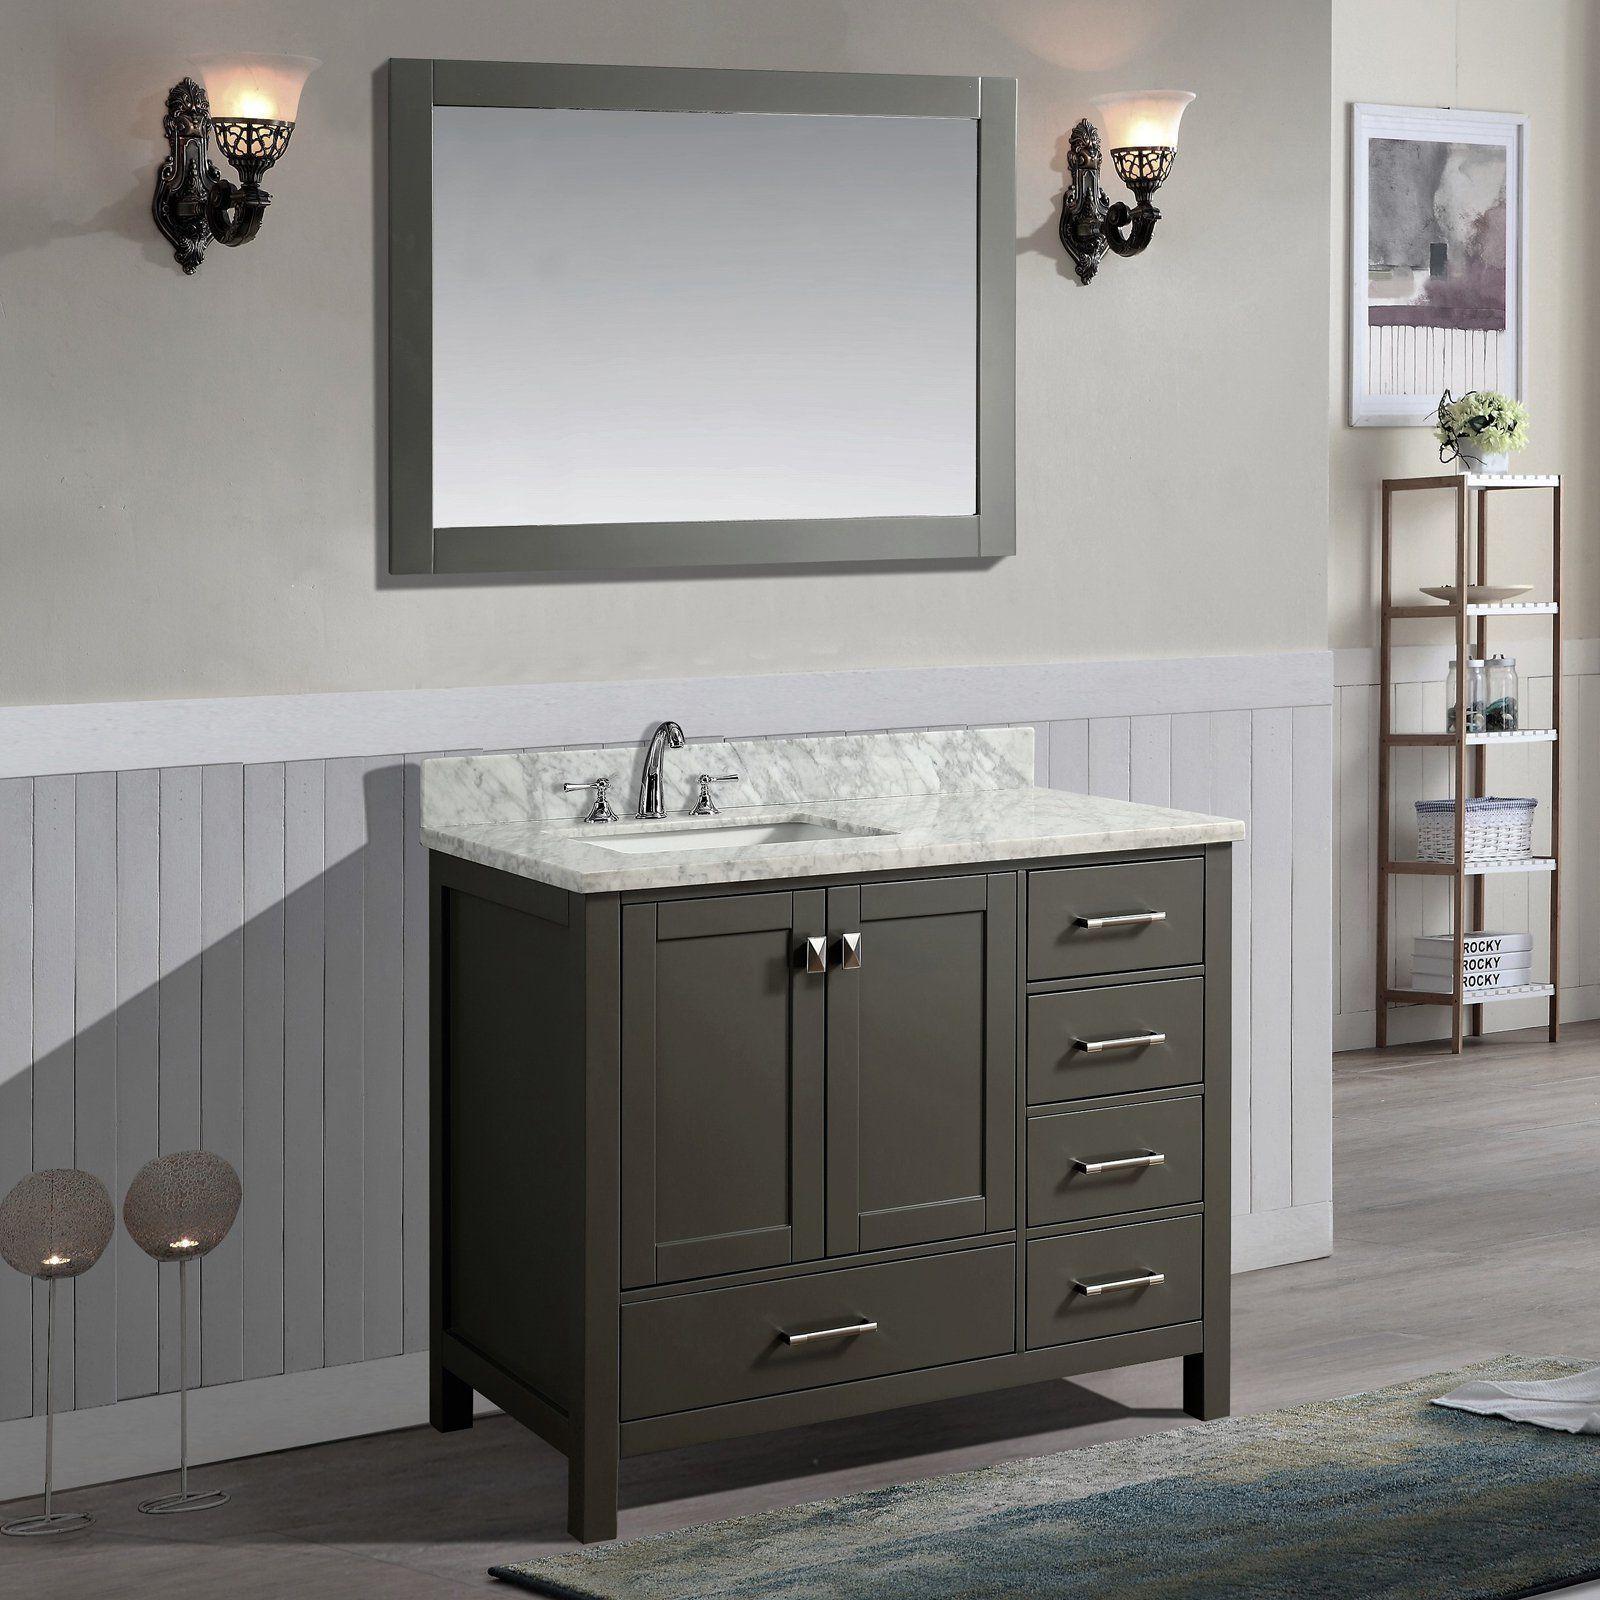 Ari Kitchen and Bath Bella 42 in. Single Bathroom Vanity Set with ...